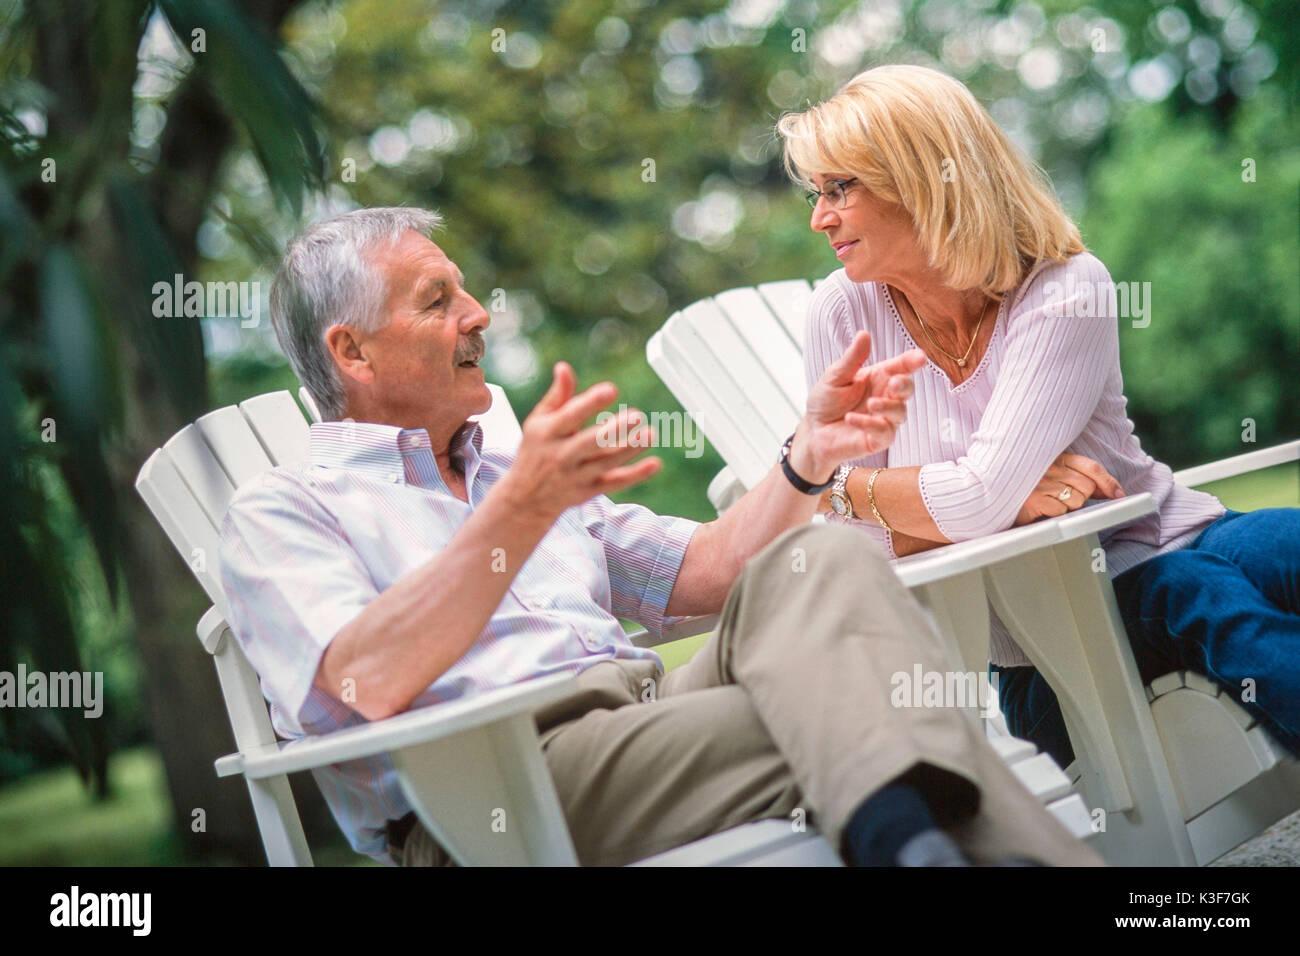 Couple talks in the garden - Stock Image